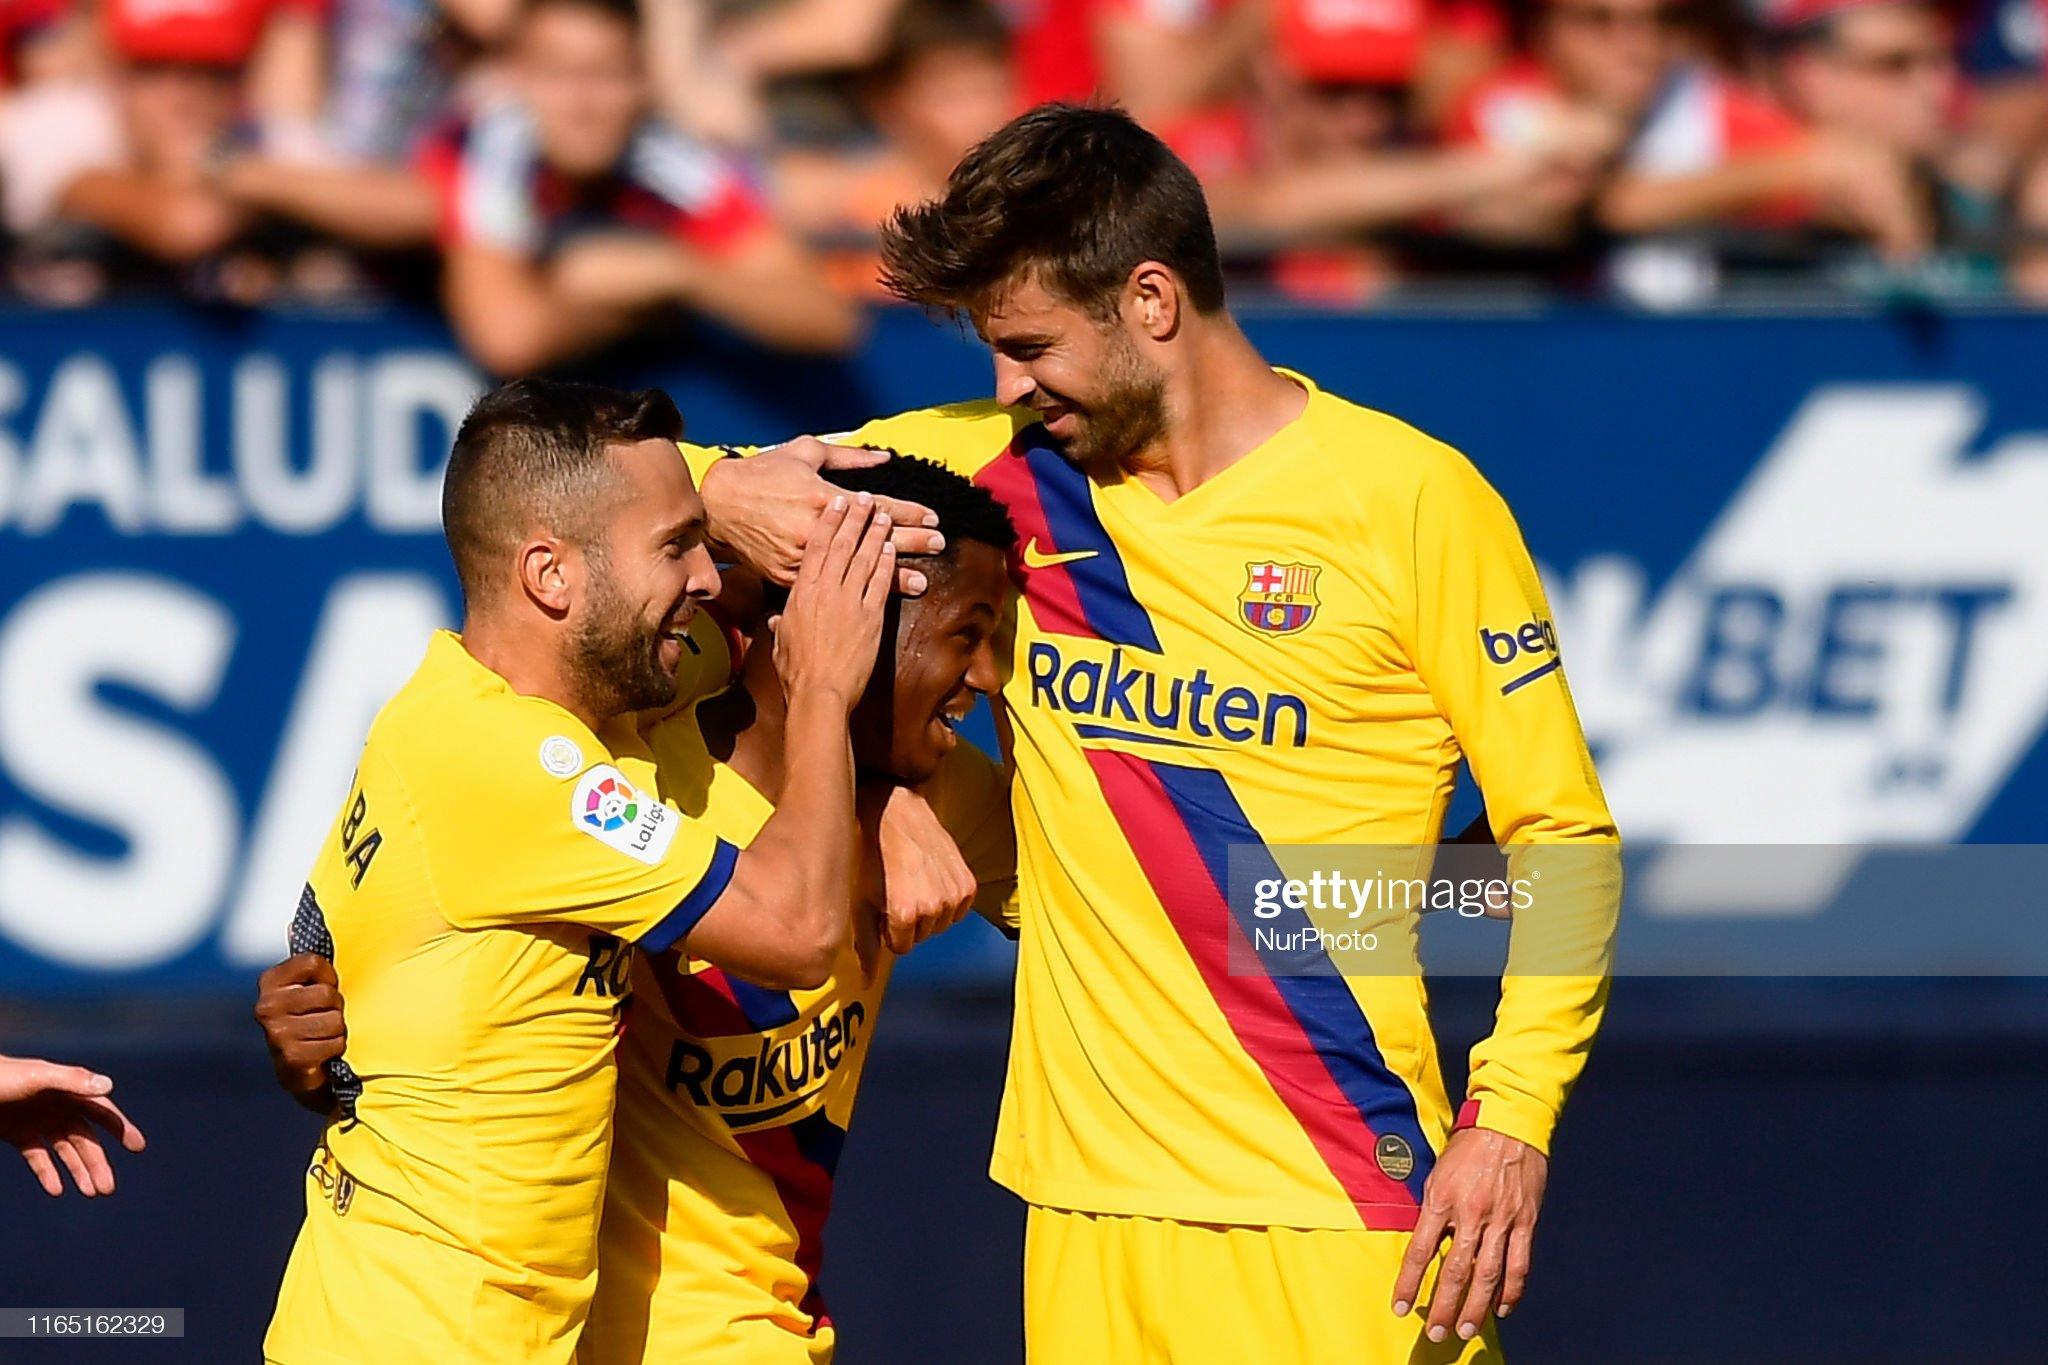 صور مباراة : أوساسونا - برشلونة 2-2 ( 31-08-2019 )  Ansu-fati-of-barcelona-celebrates-after-scoring-his-sides-first-goal-picture-id1165162329?s=2048x2048